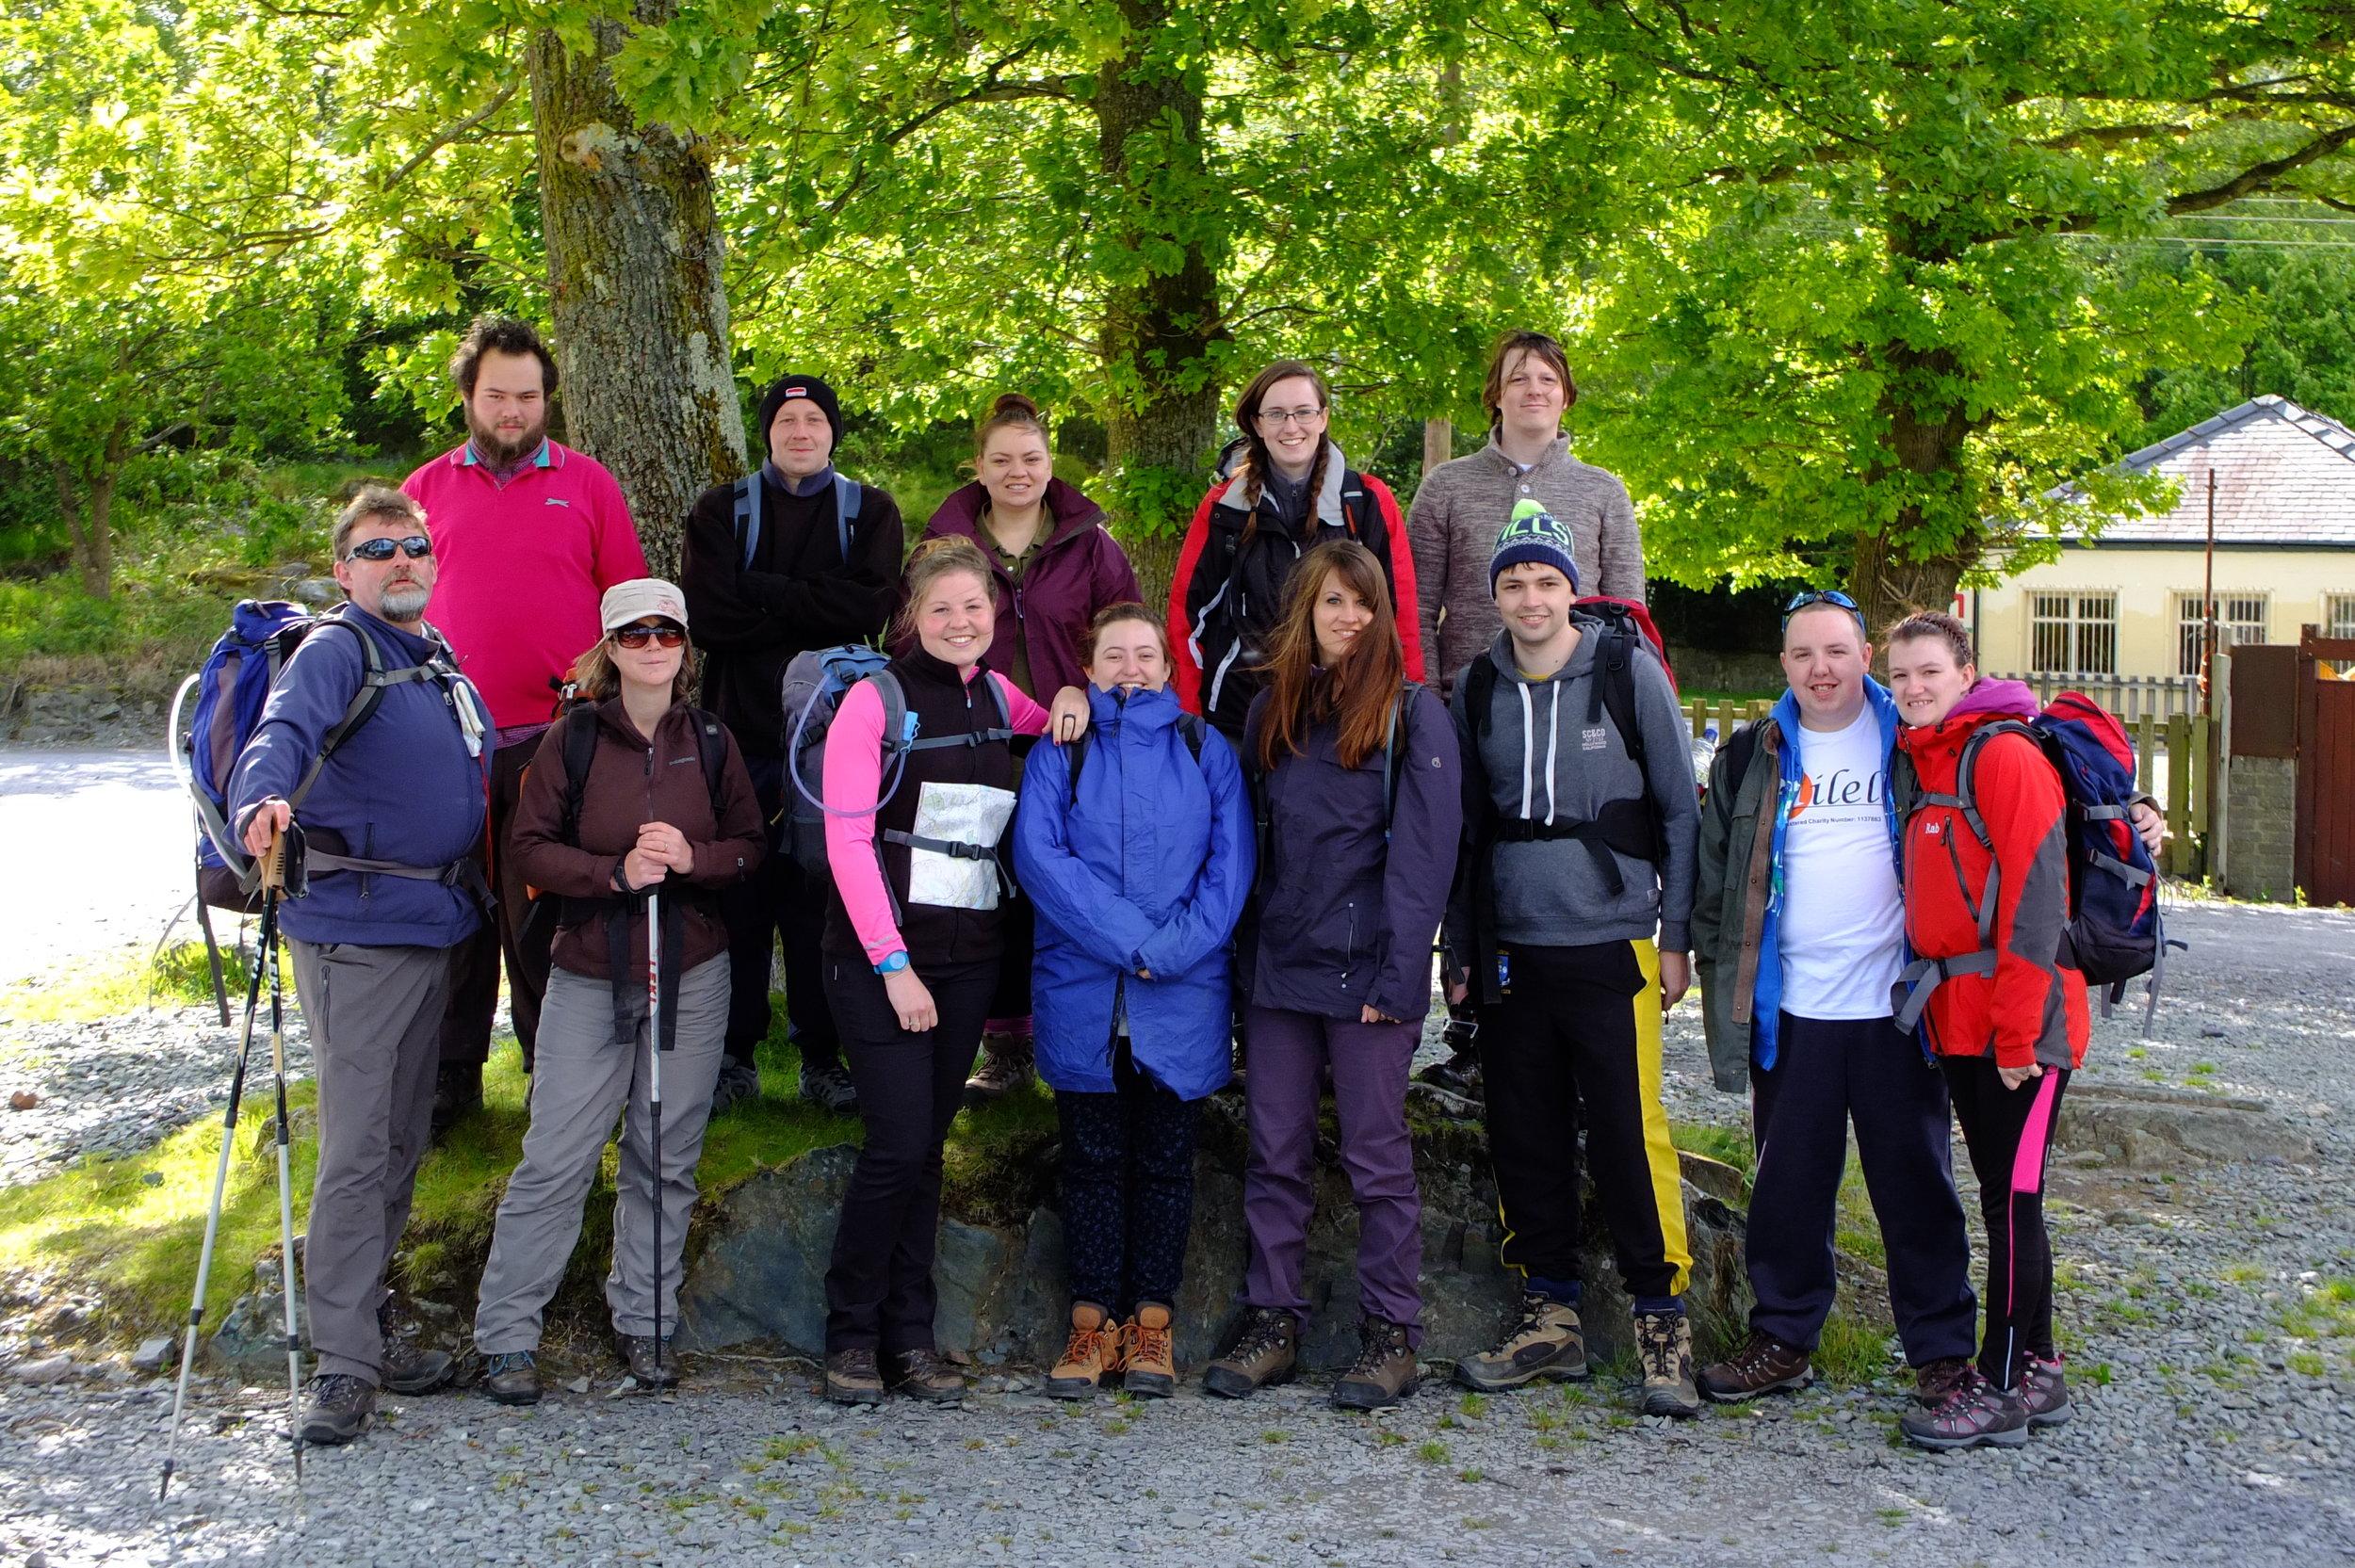 The Milele Mountain Climbers